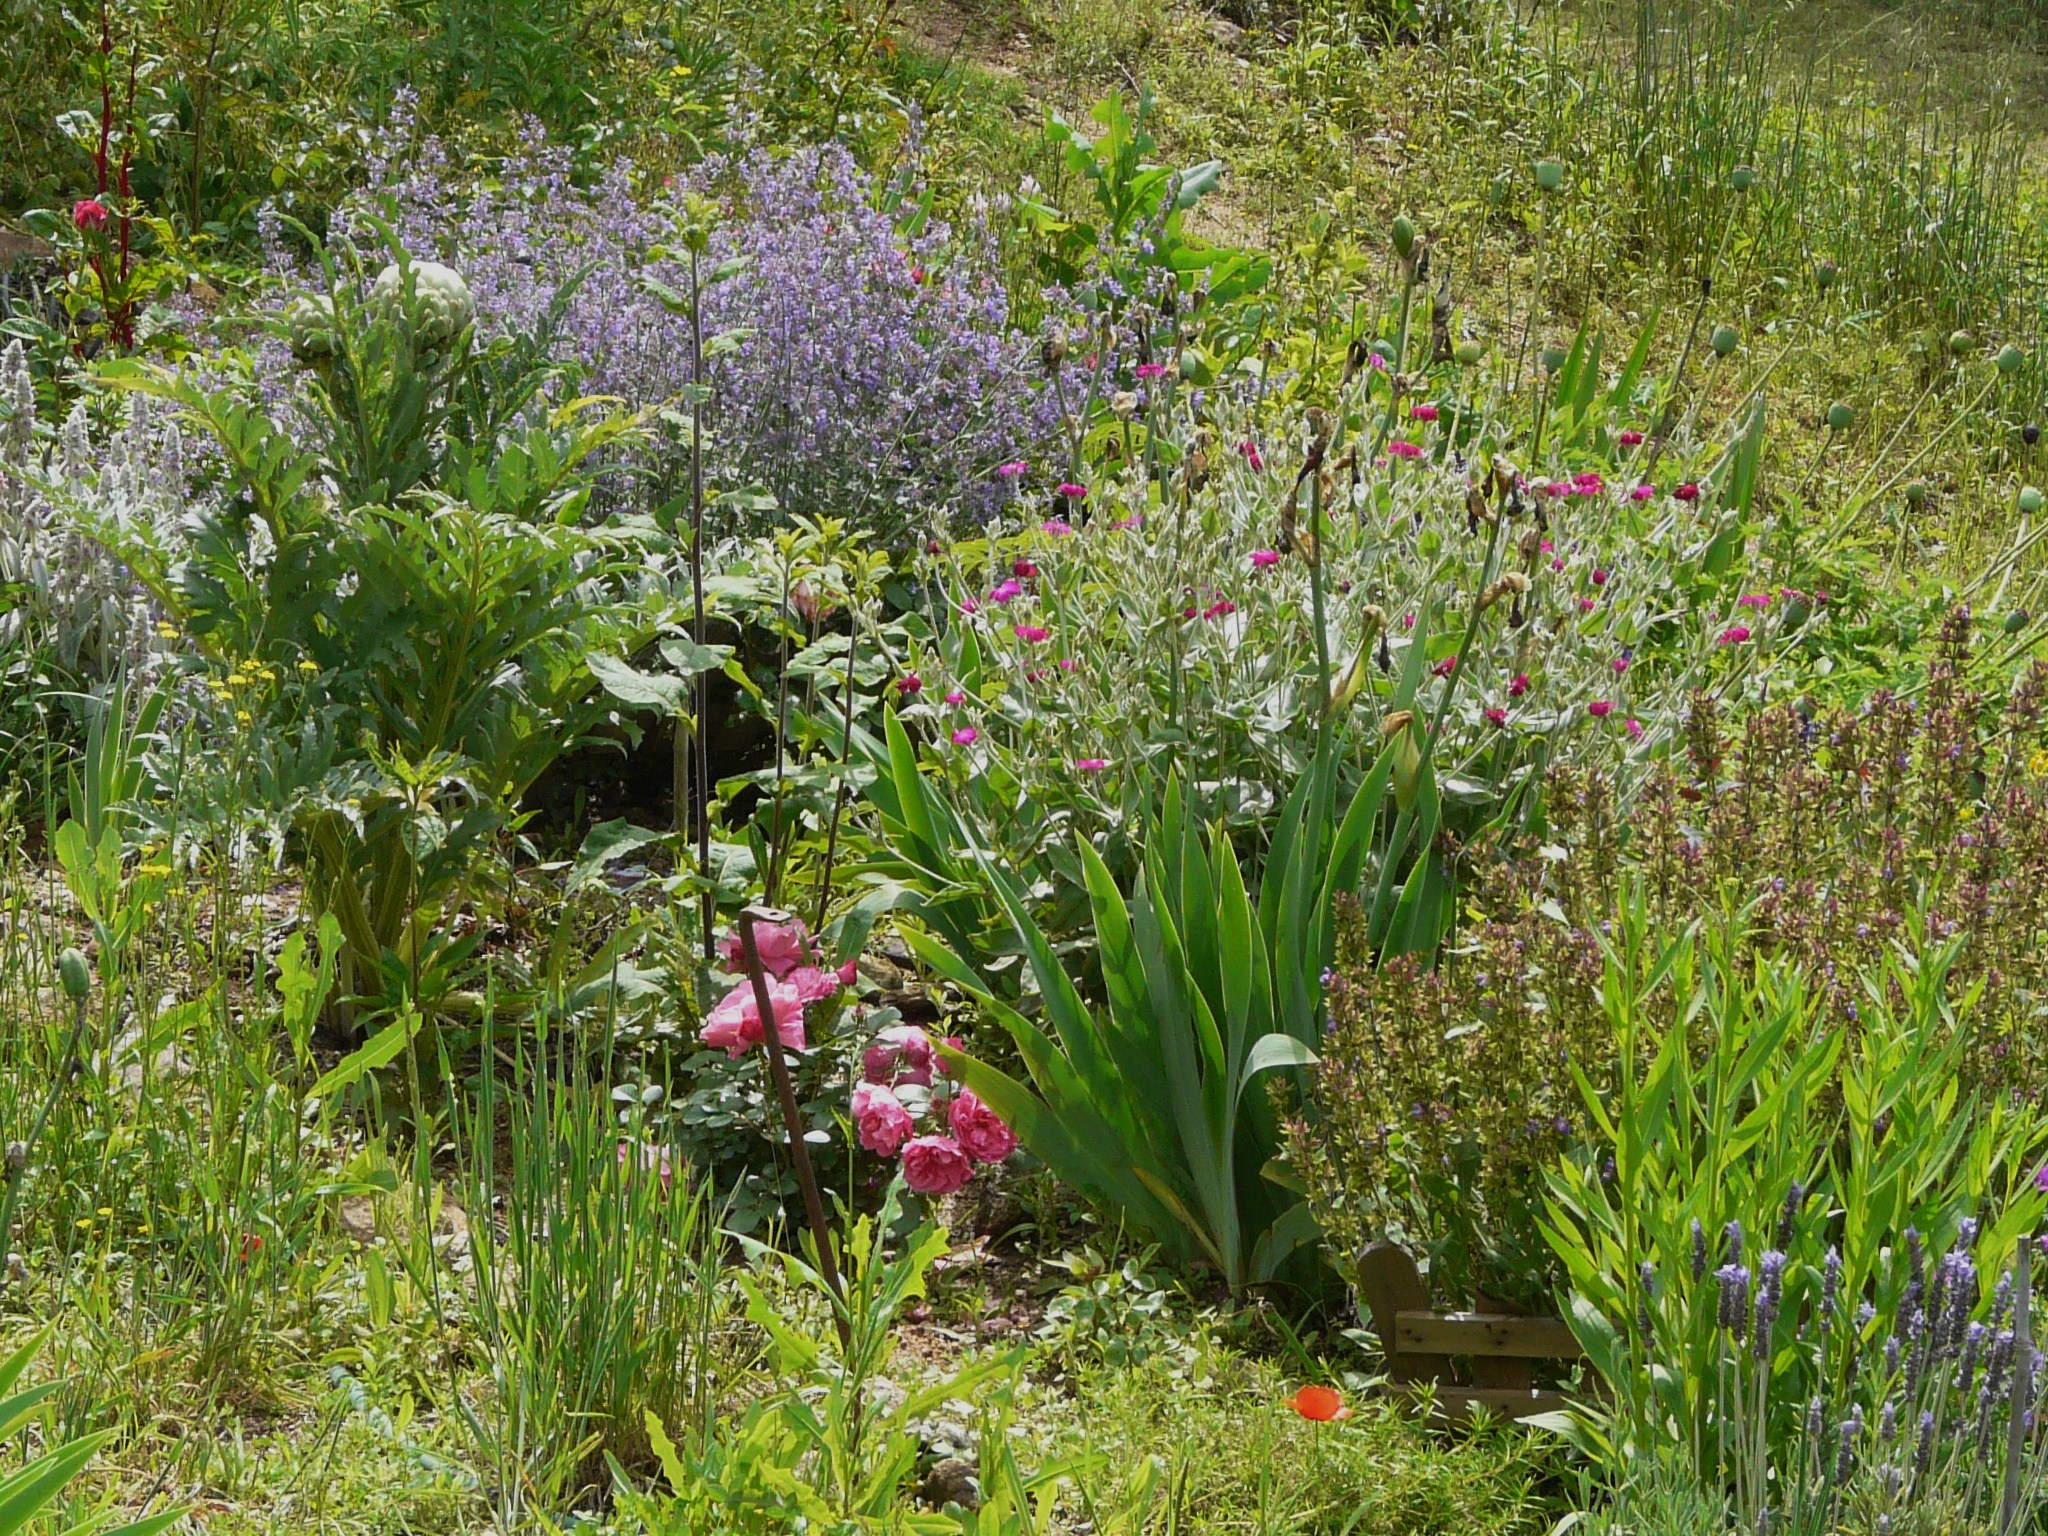 Jardin anglais en ardeche mon boudoir multim dia for Jardin en anglais